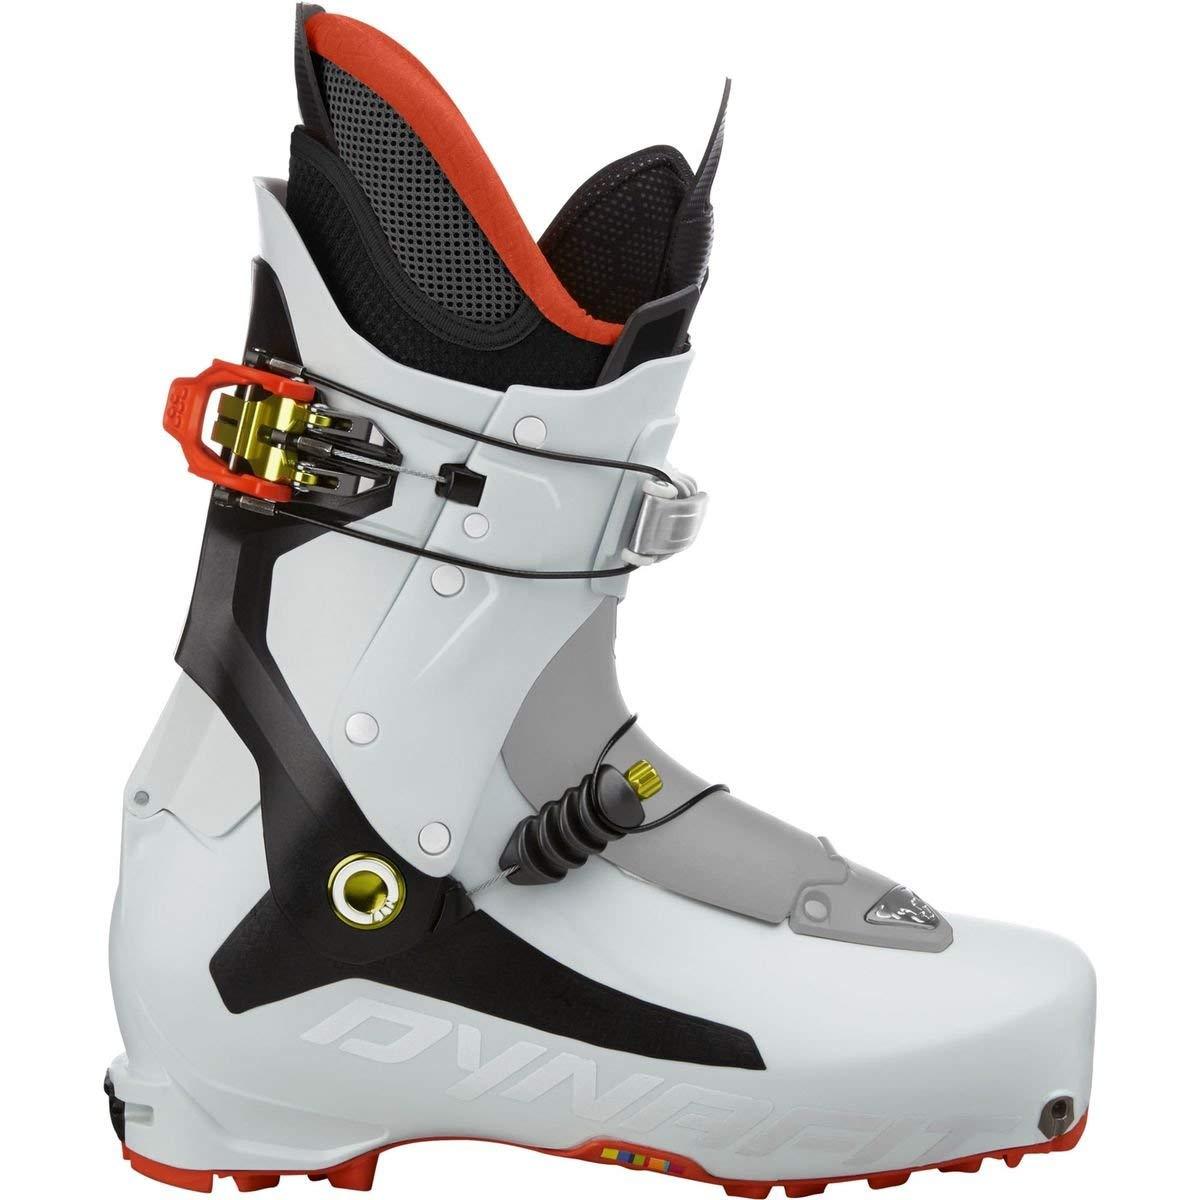 Dynafit TLT7 Expendition CR Ski Boot - Men's